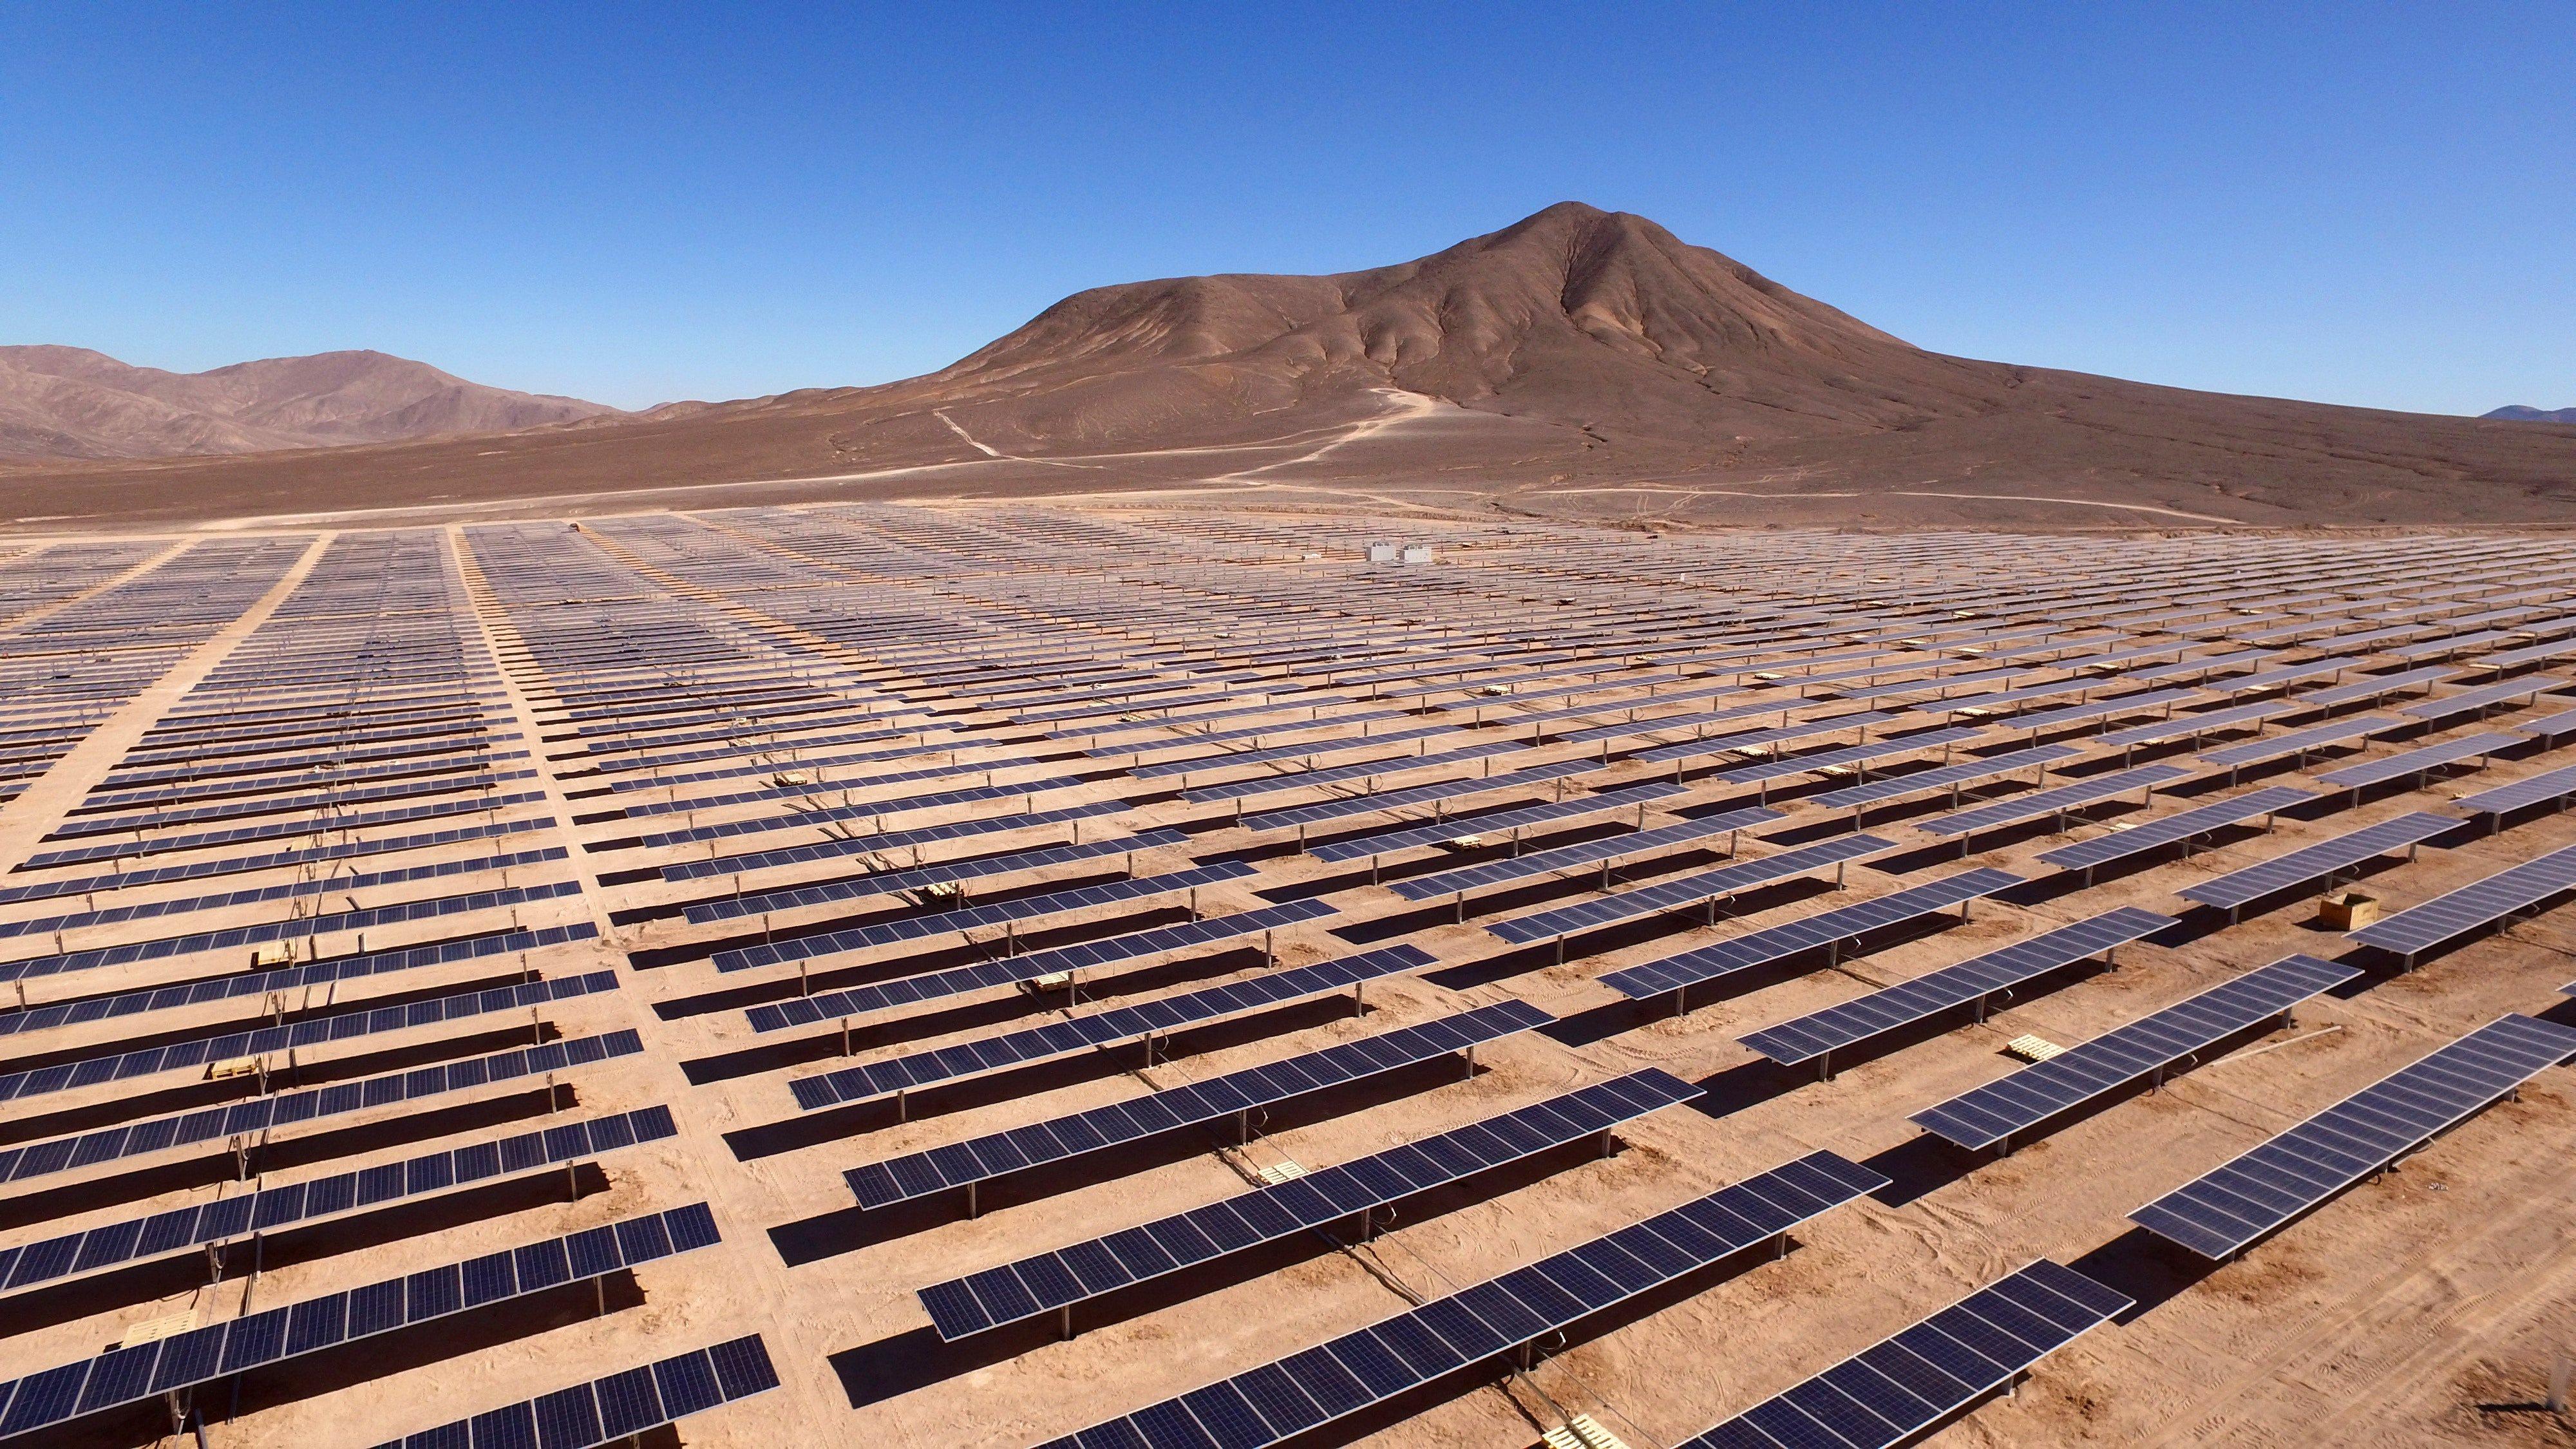 Bolero solar plant, Région de Antofagasta, Chile. Credit: Antonio Garcia/Unsplash, 2017.